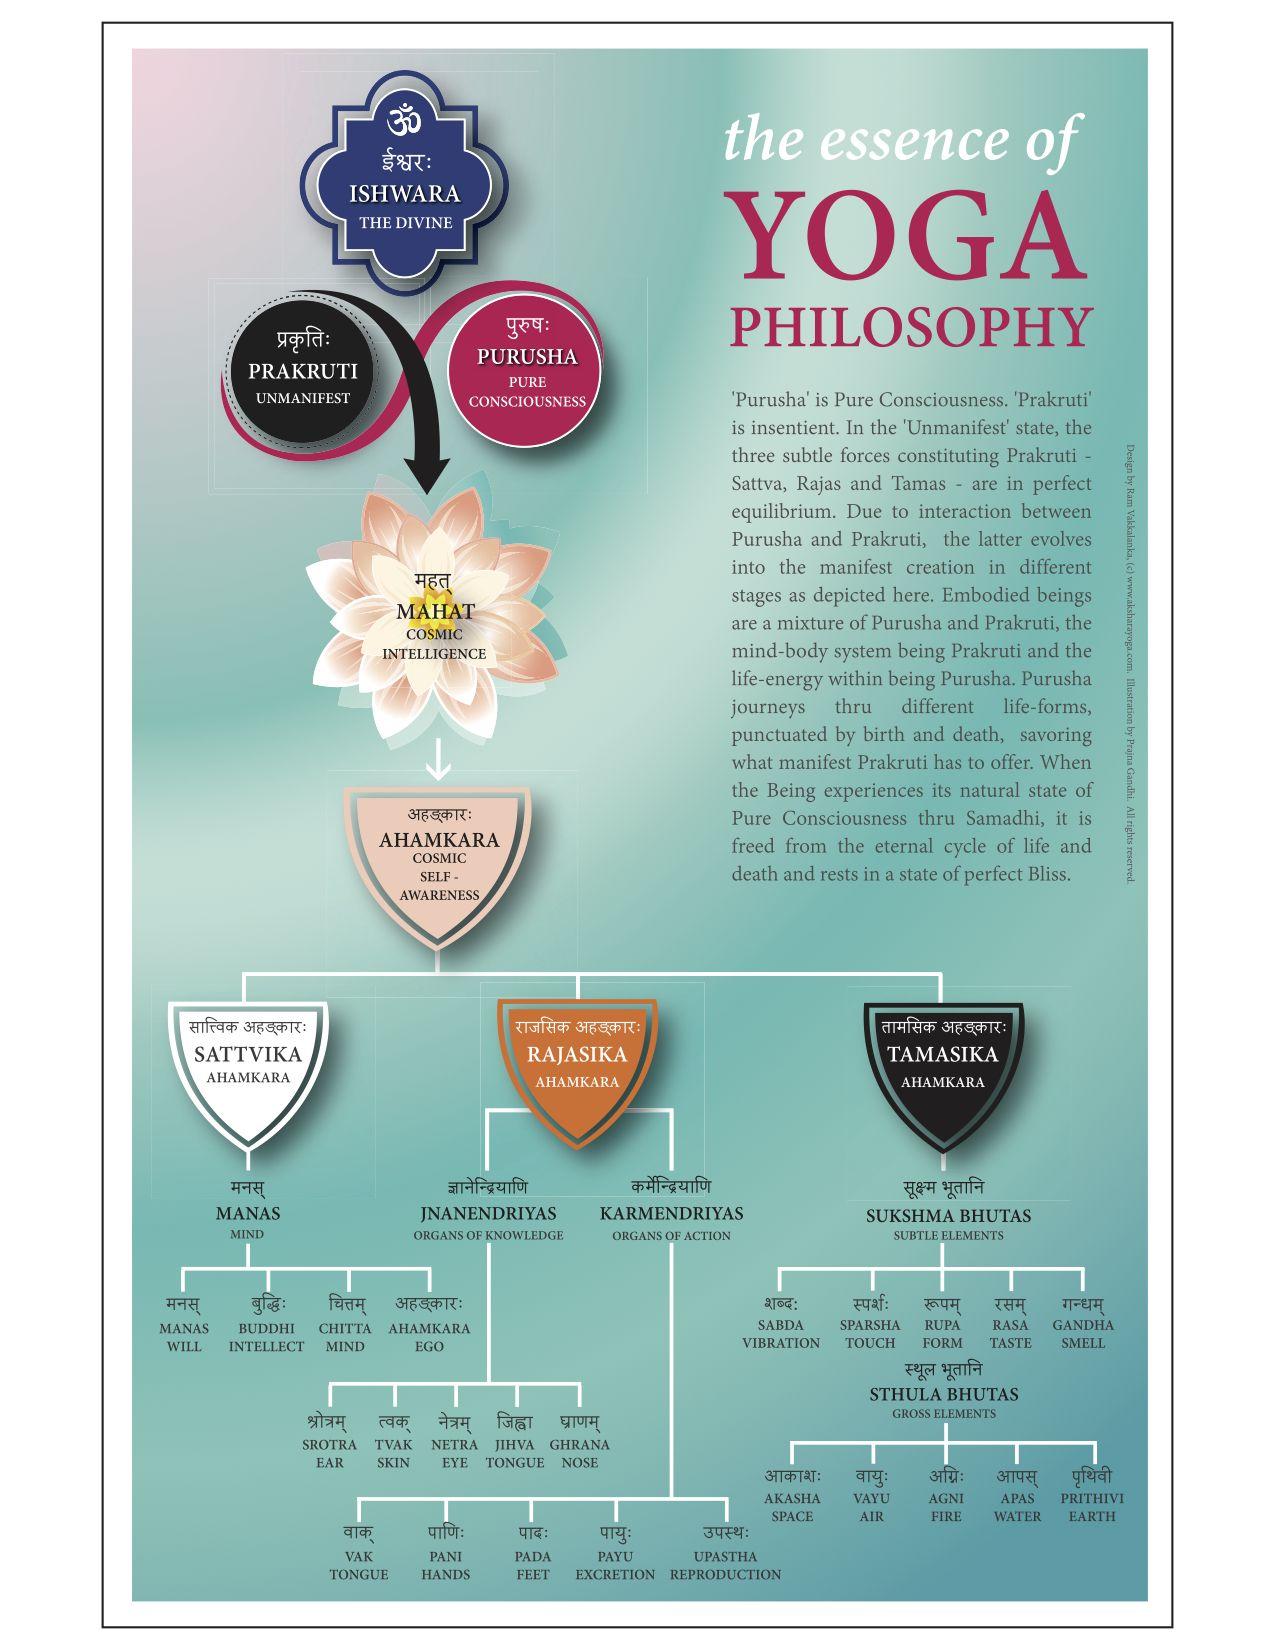 Samkhya/Yoga philosophy explained in a nutshell...